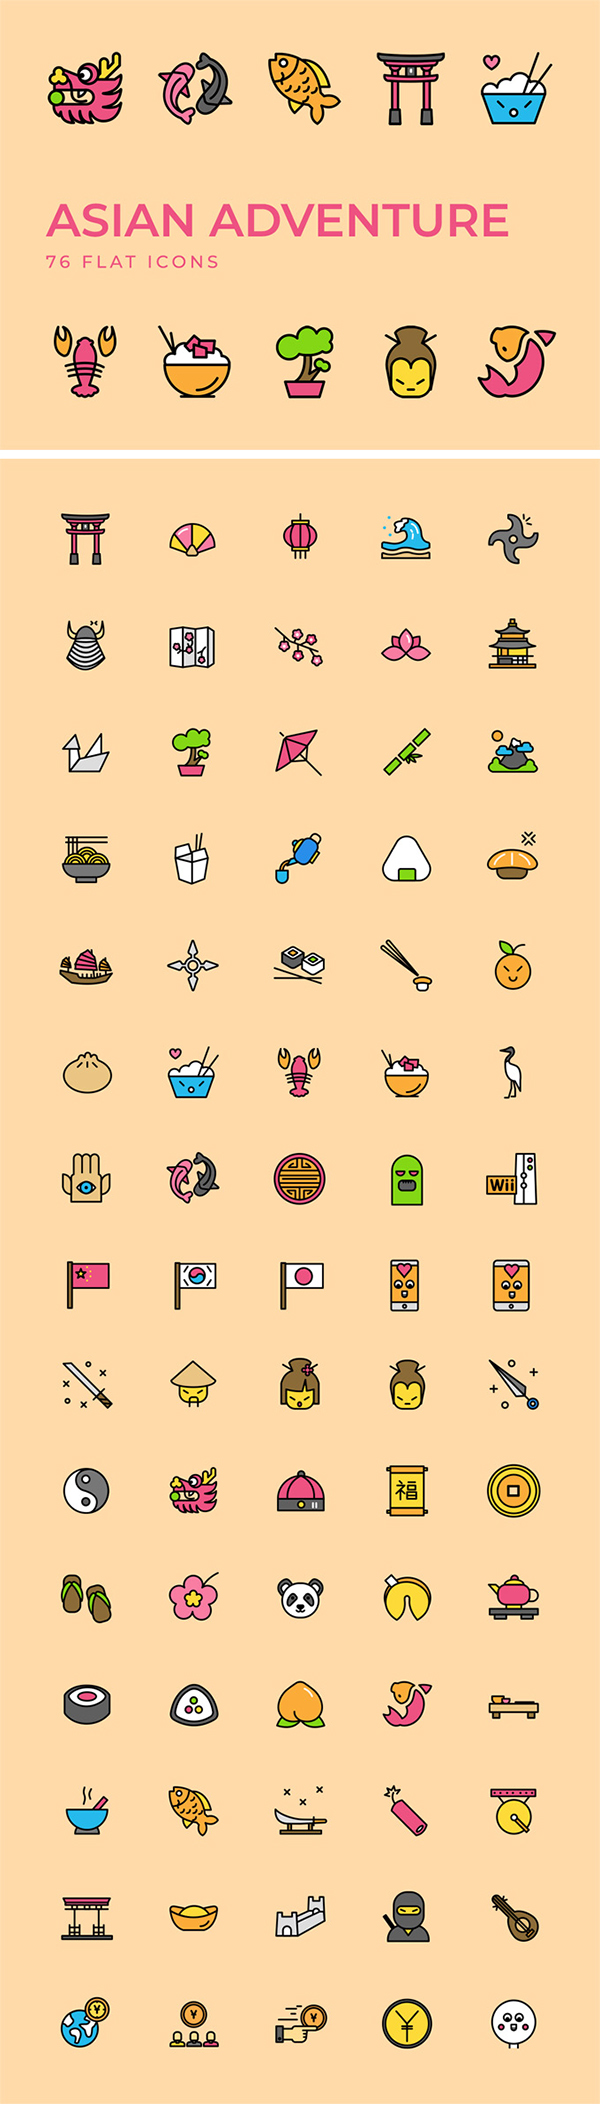 Asian Adventure Flat Icons Kit